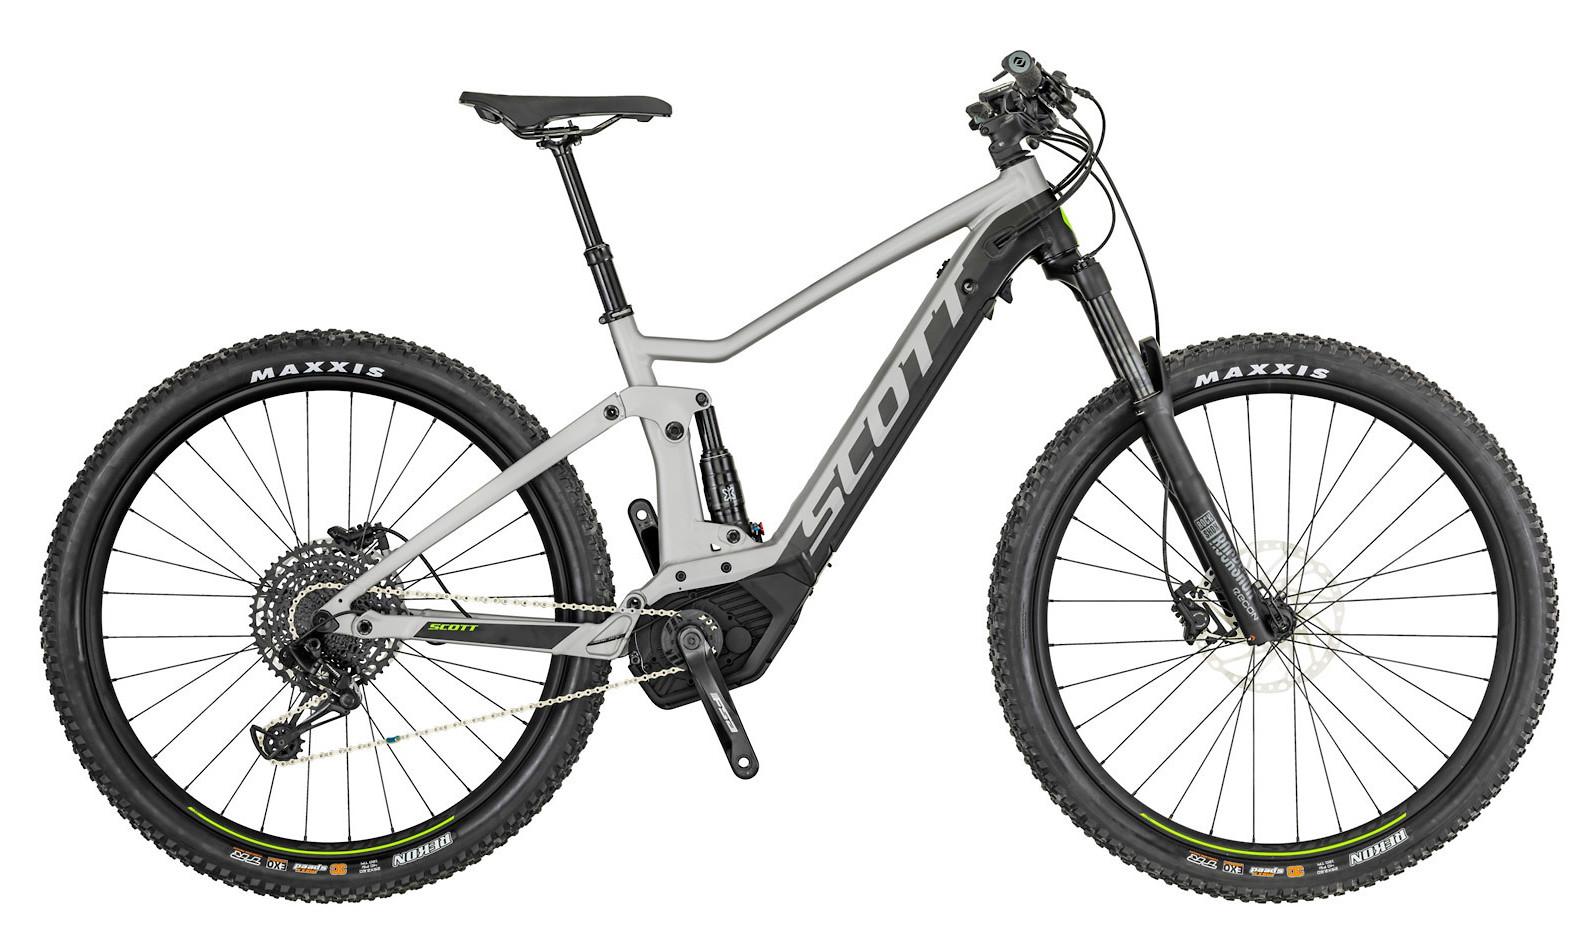 2019 Scott Strike eRide 930 E-Bike